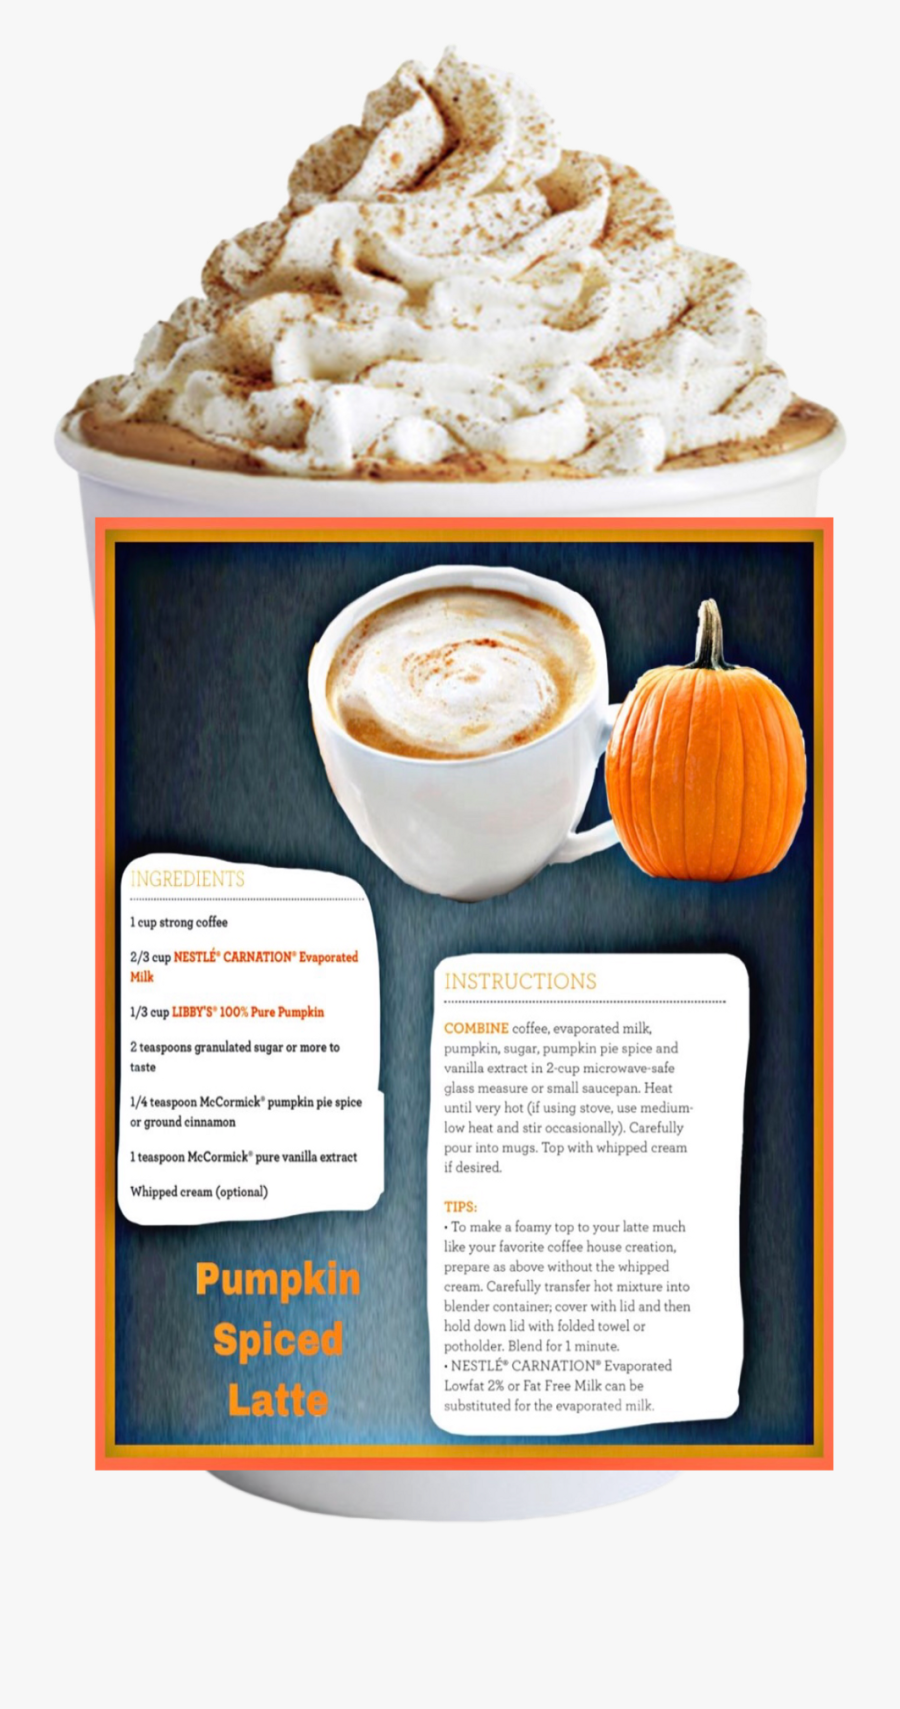 Starbucks Cup Pumpkin Spice Latte , Png Download - Pumpkin Spice Latte Starbucks, Transparent Clipart